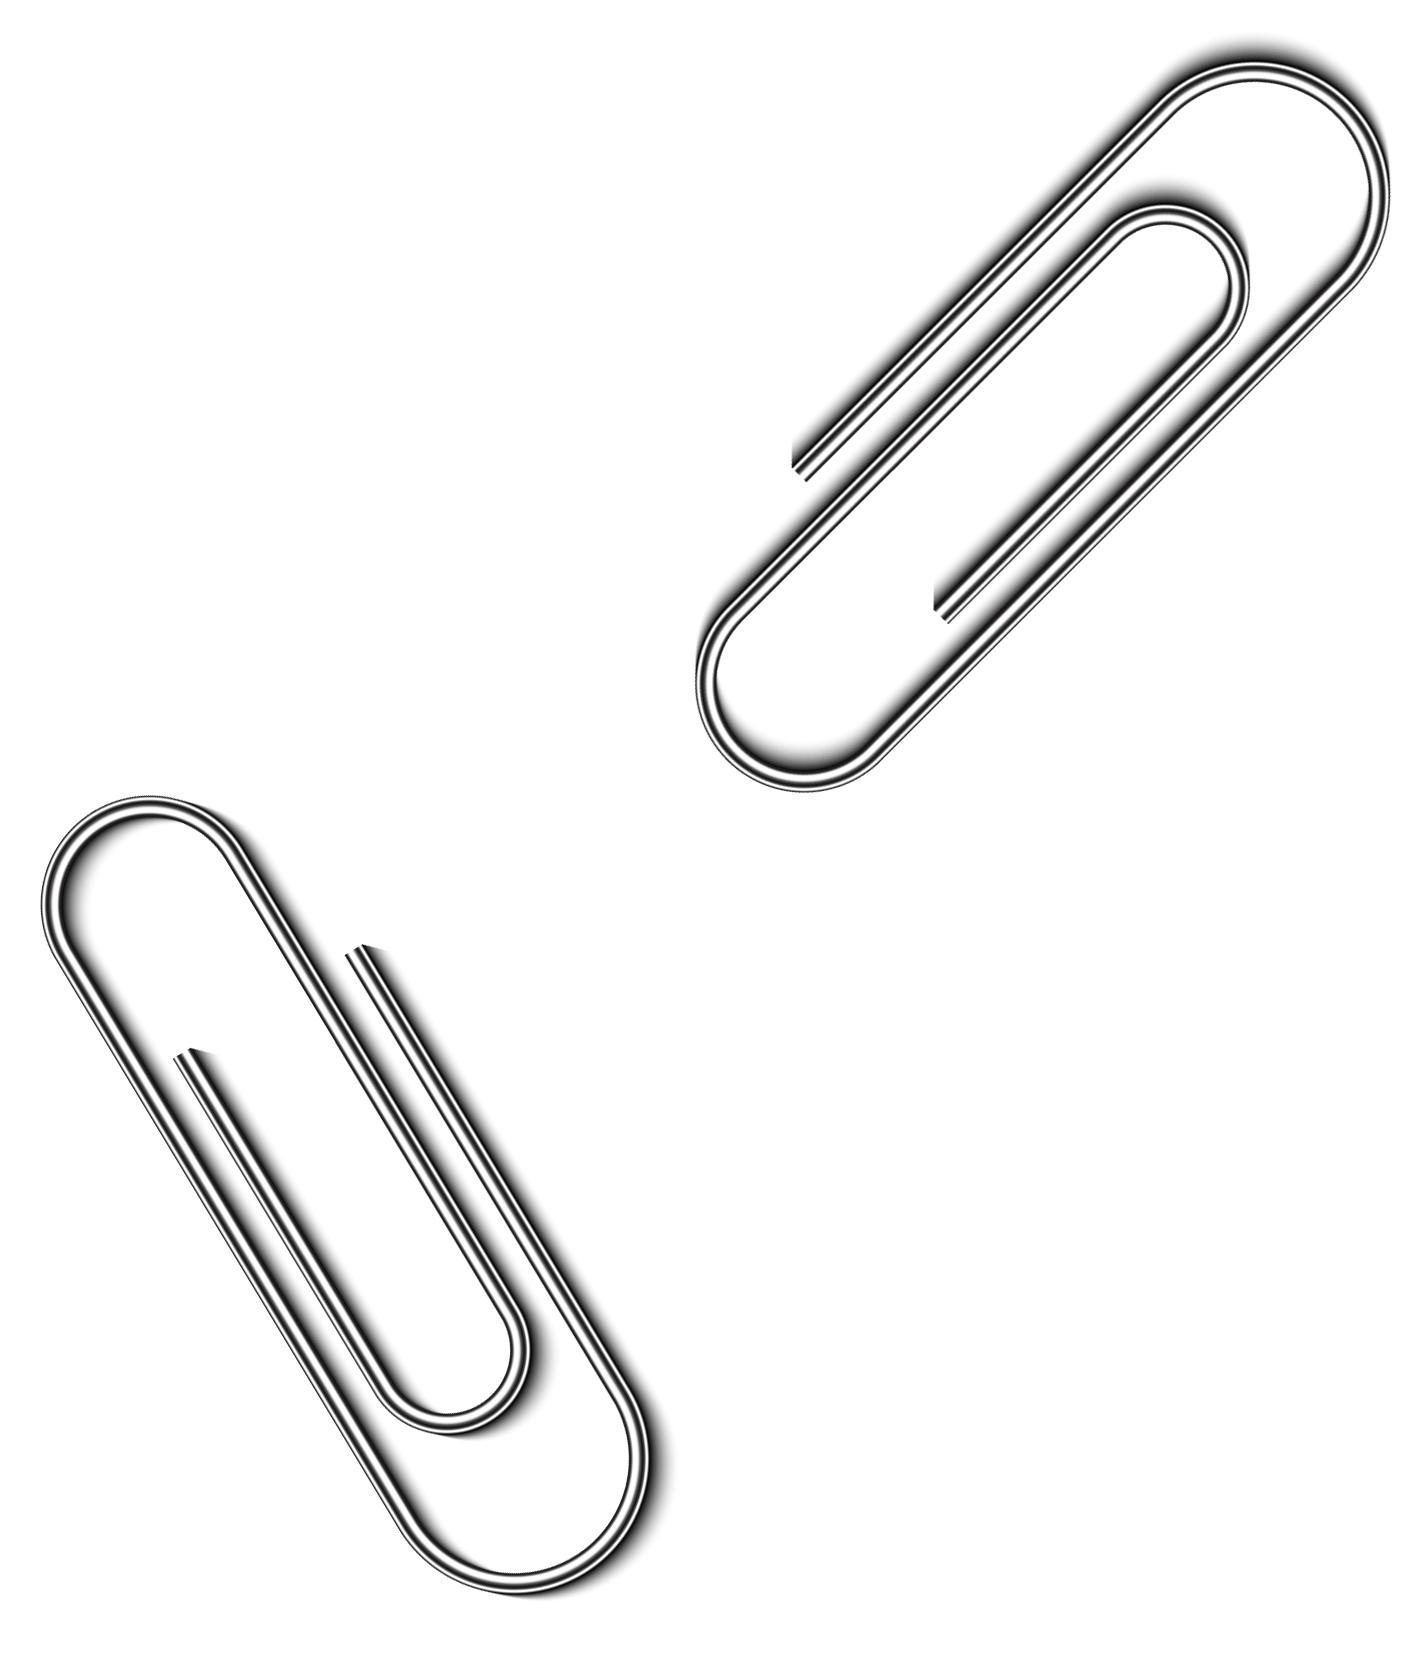 paper clips 2.jpg